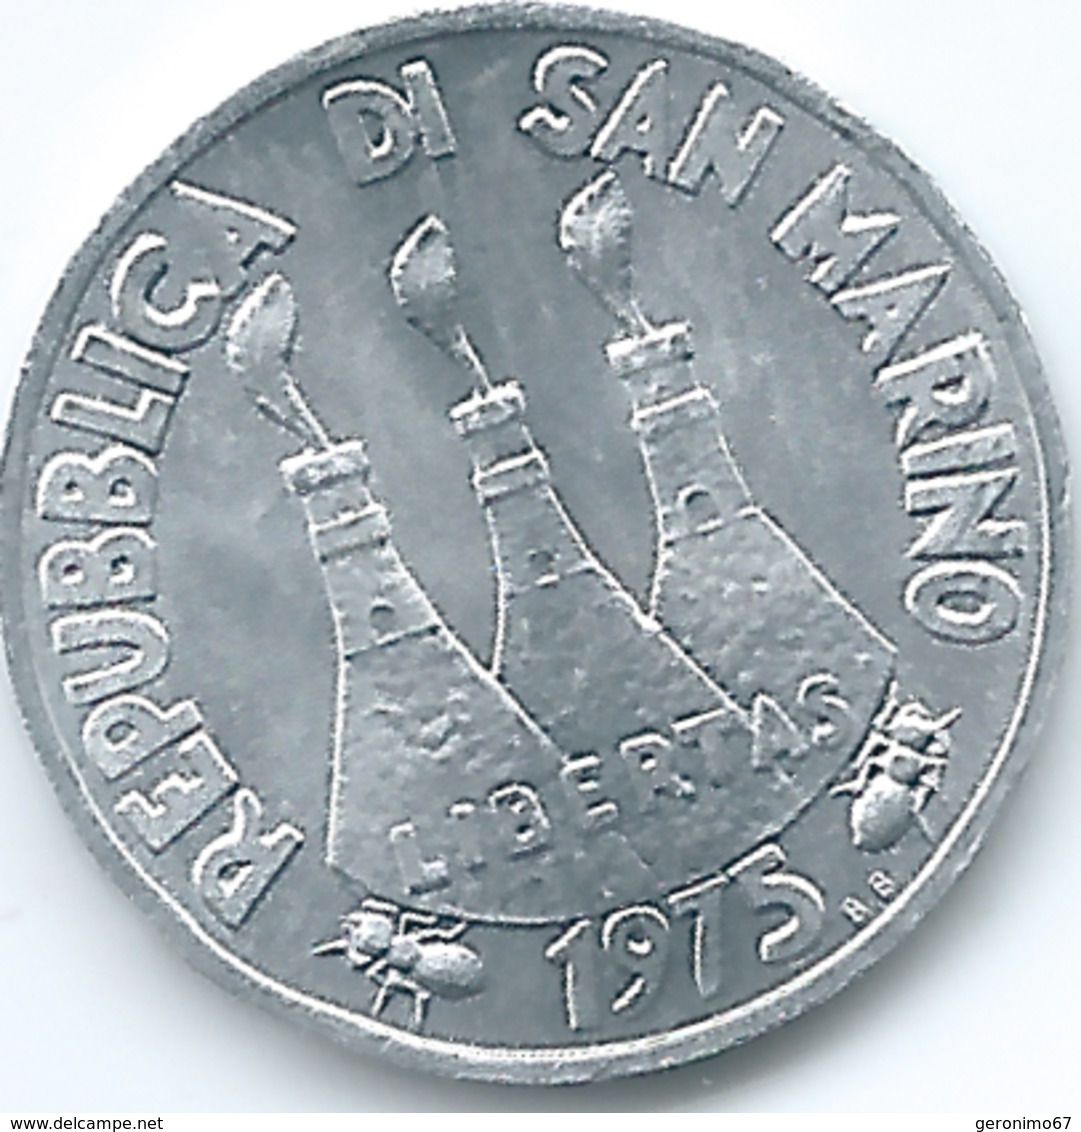 San Marino - 1975 - 1 Lira - KM40 - San Marino